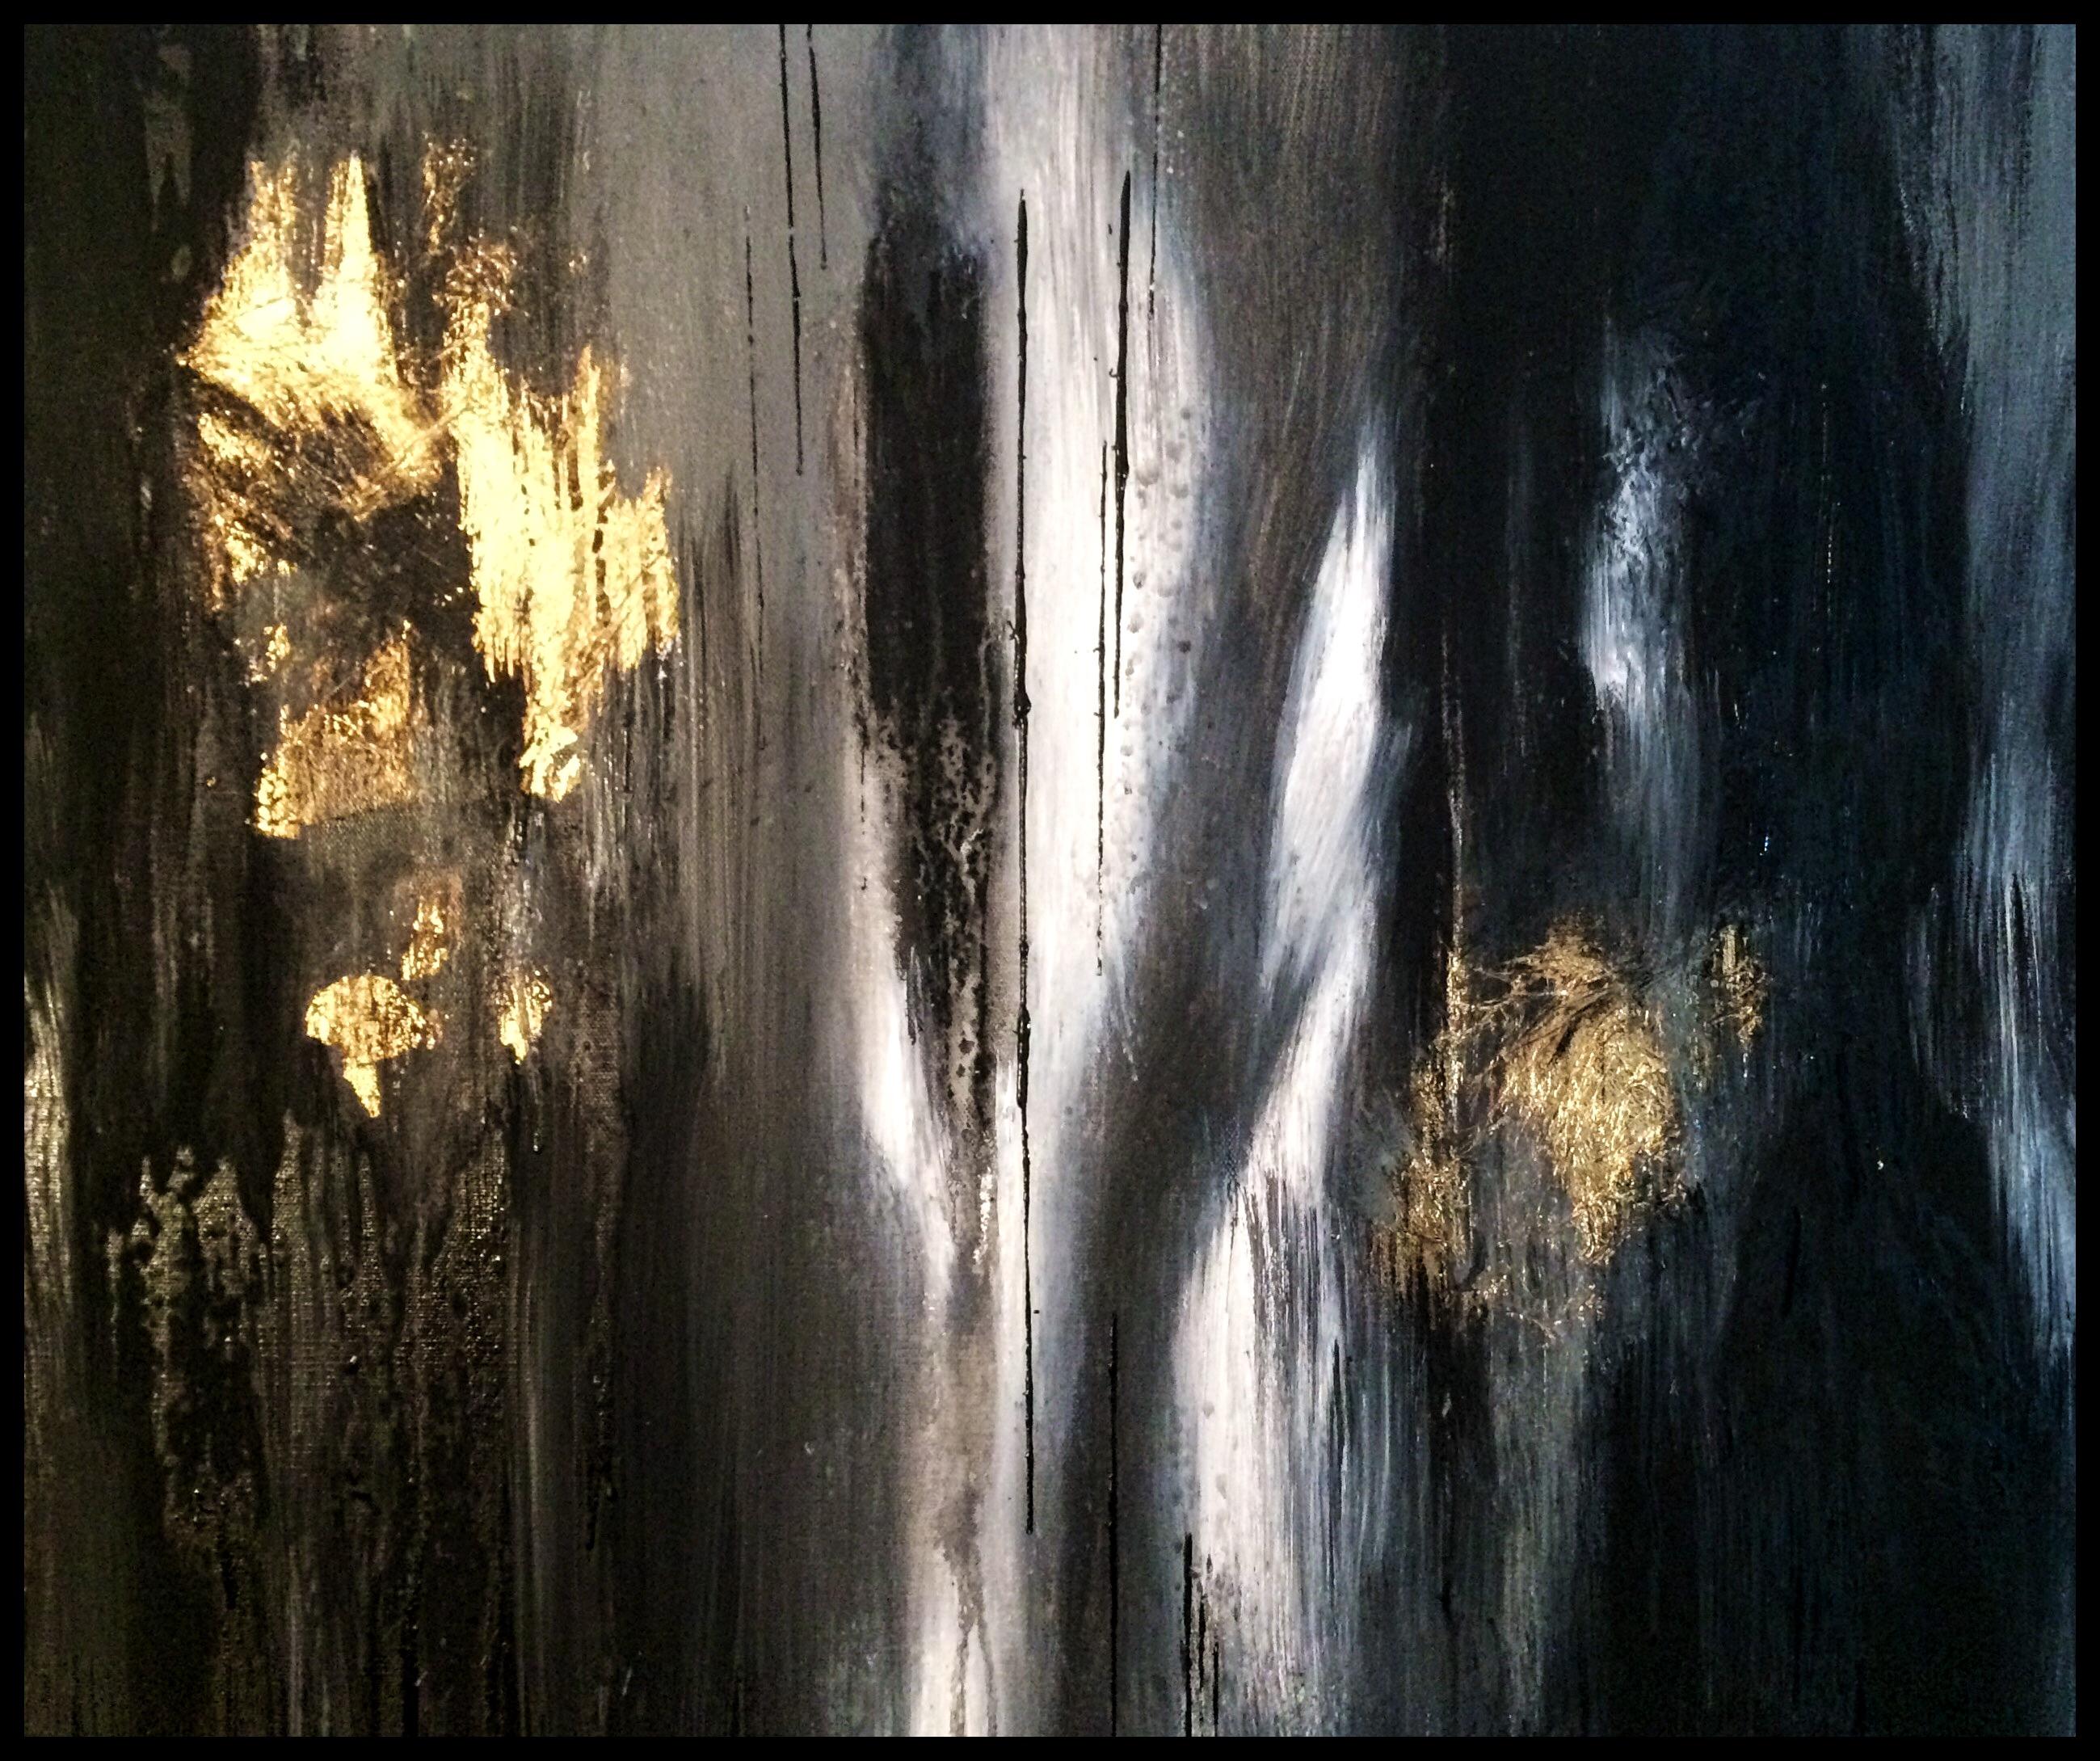 Intermission artwork by Jennifer King - art listed for sale on Artplode